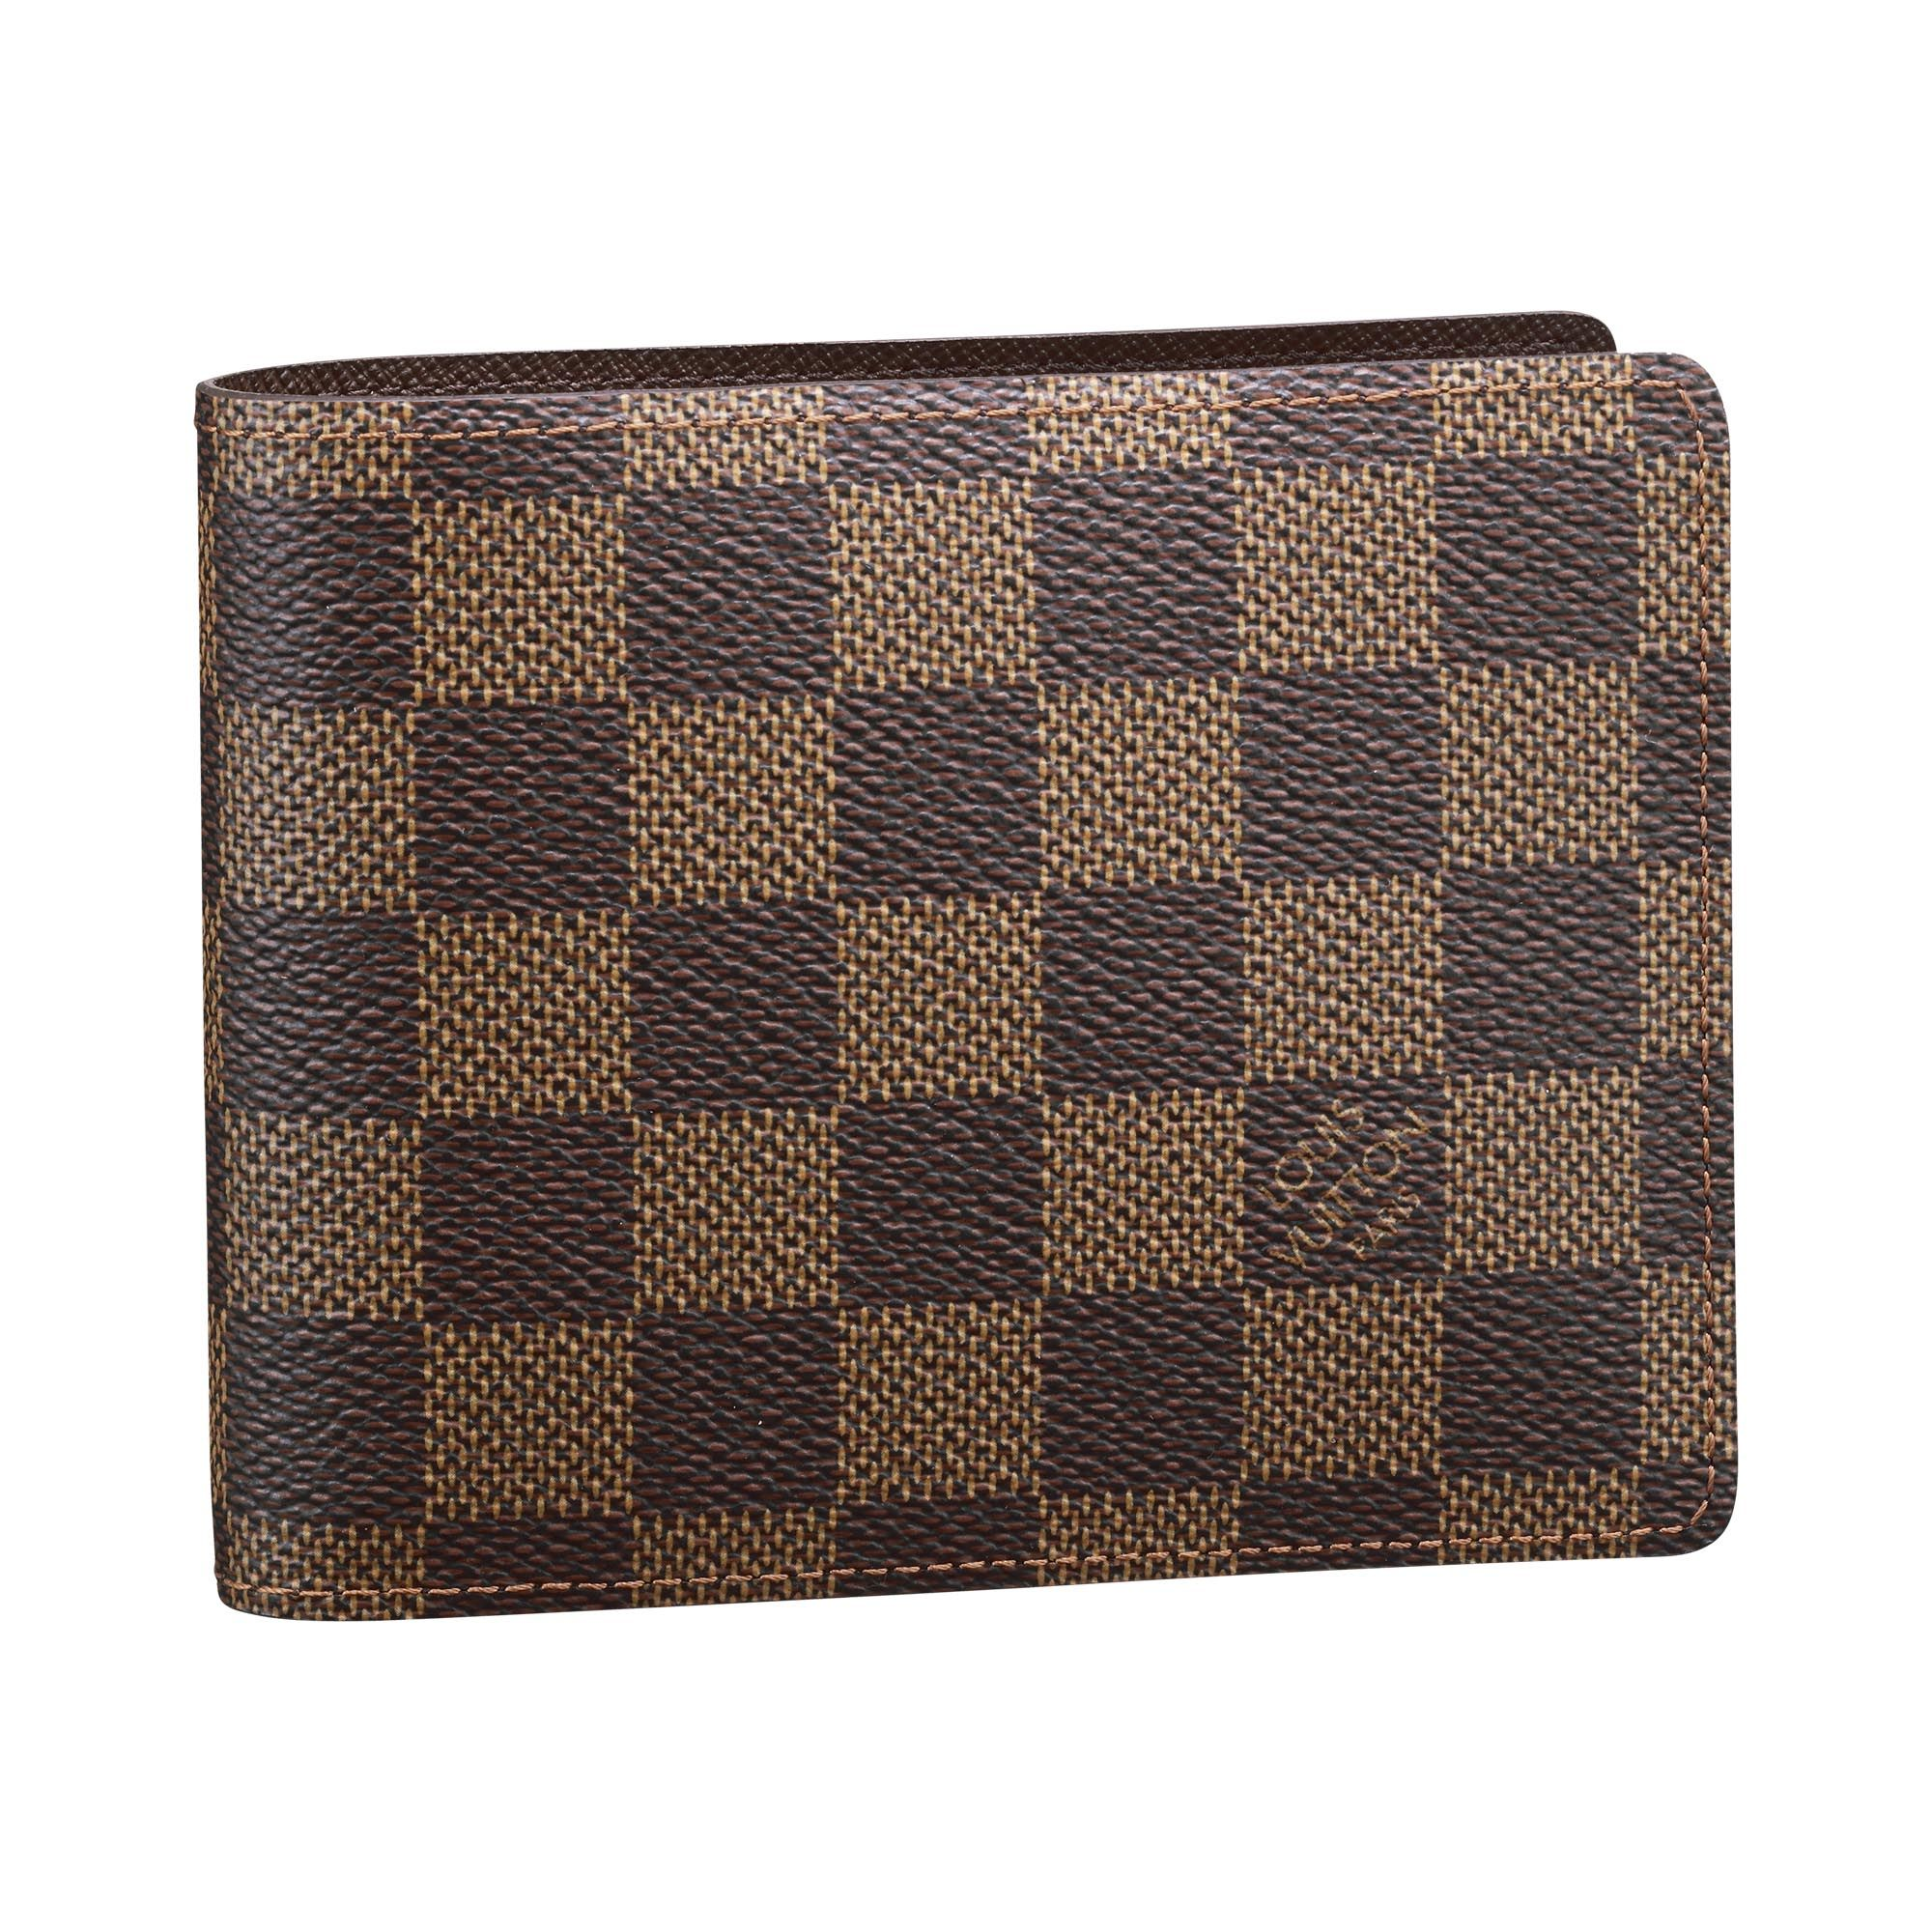 9dc77ca921e1 Louis Vuitton Men s Wallet (Damier Eben